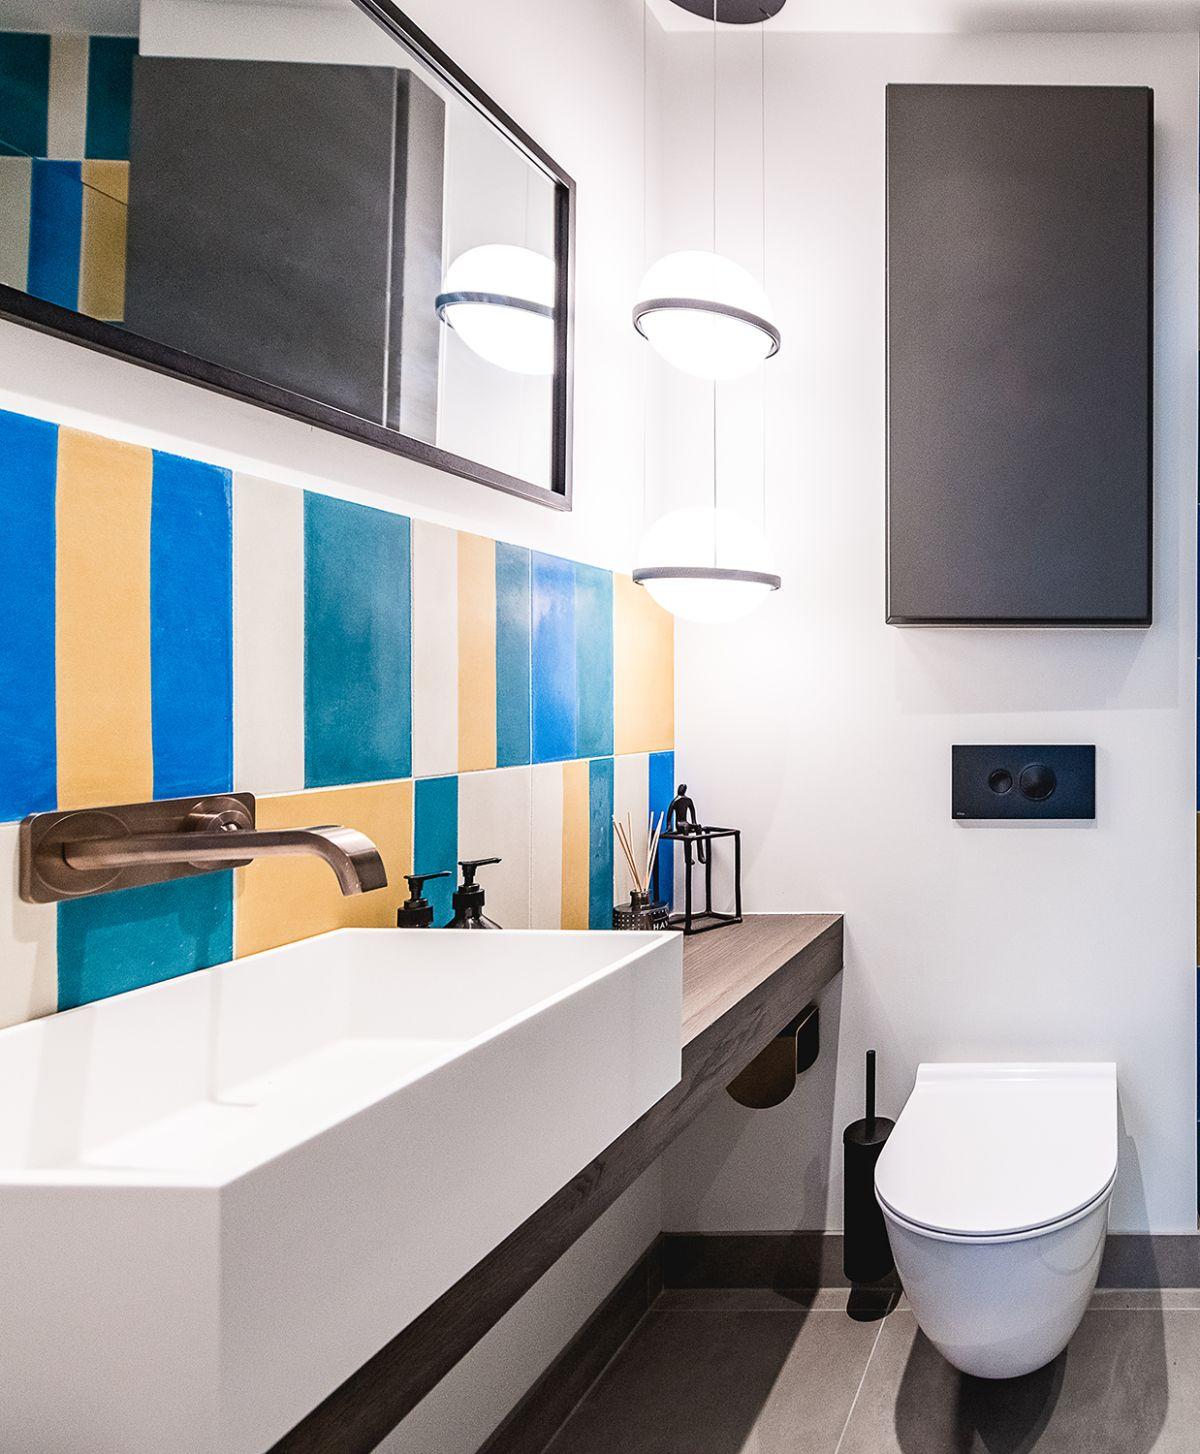 Enclosed Lanai Design Ideas, Modern Bathroom Ideas Make A Style Splash With Our Expert Guide Livingetc